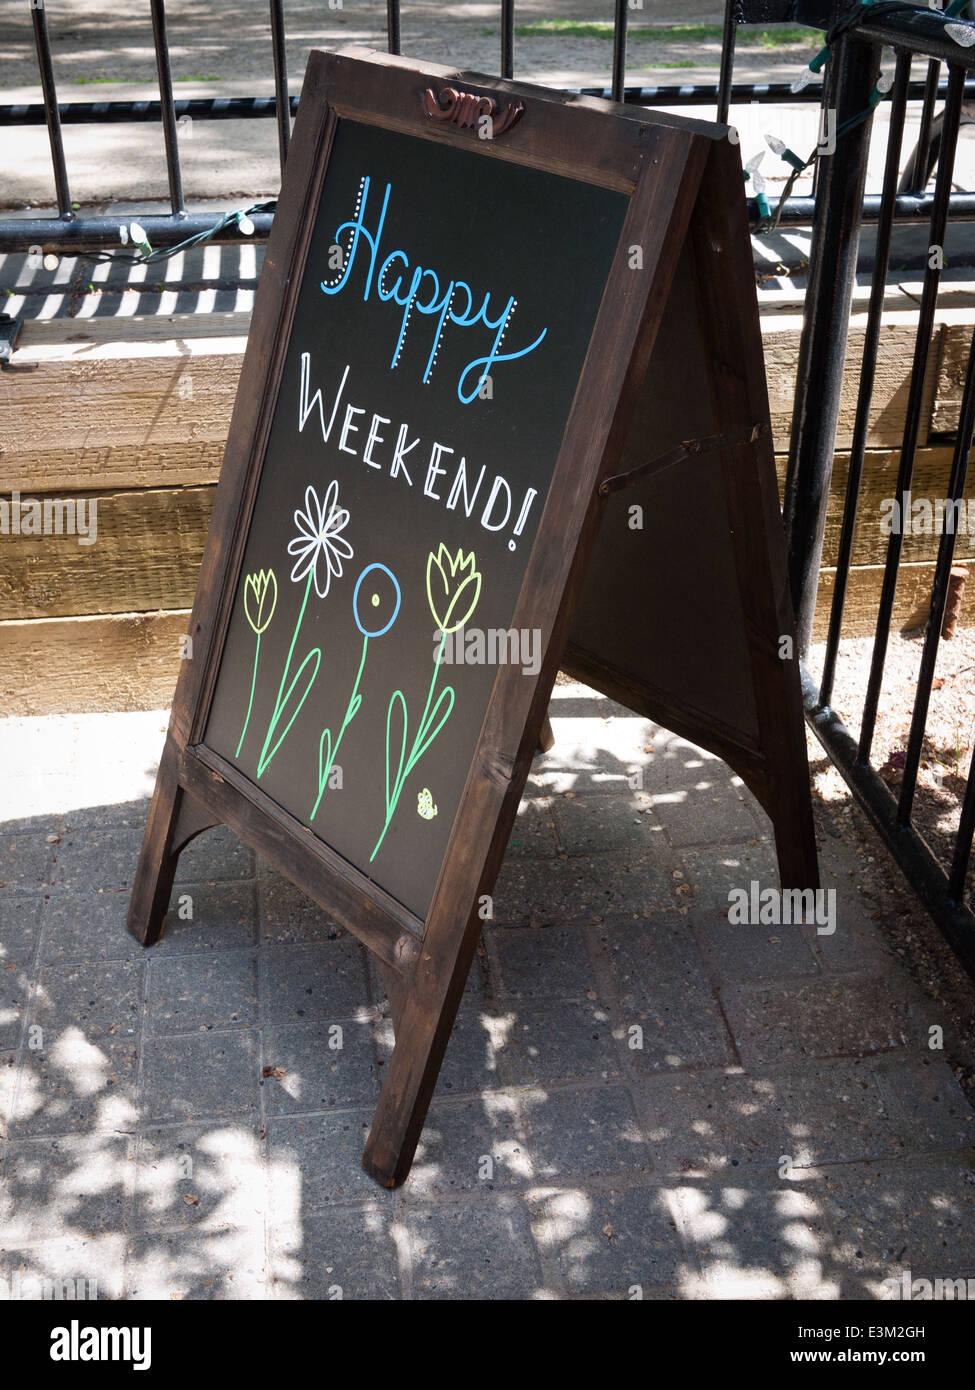 Un signo exterior que dice: Feliz fin de semana! Imagen De Stock